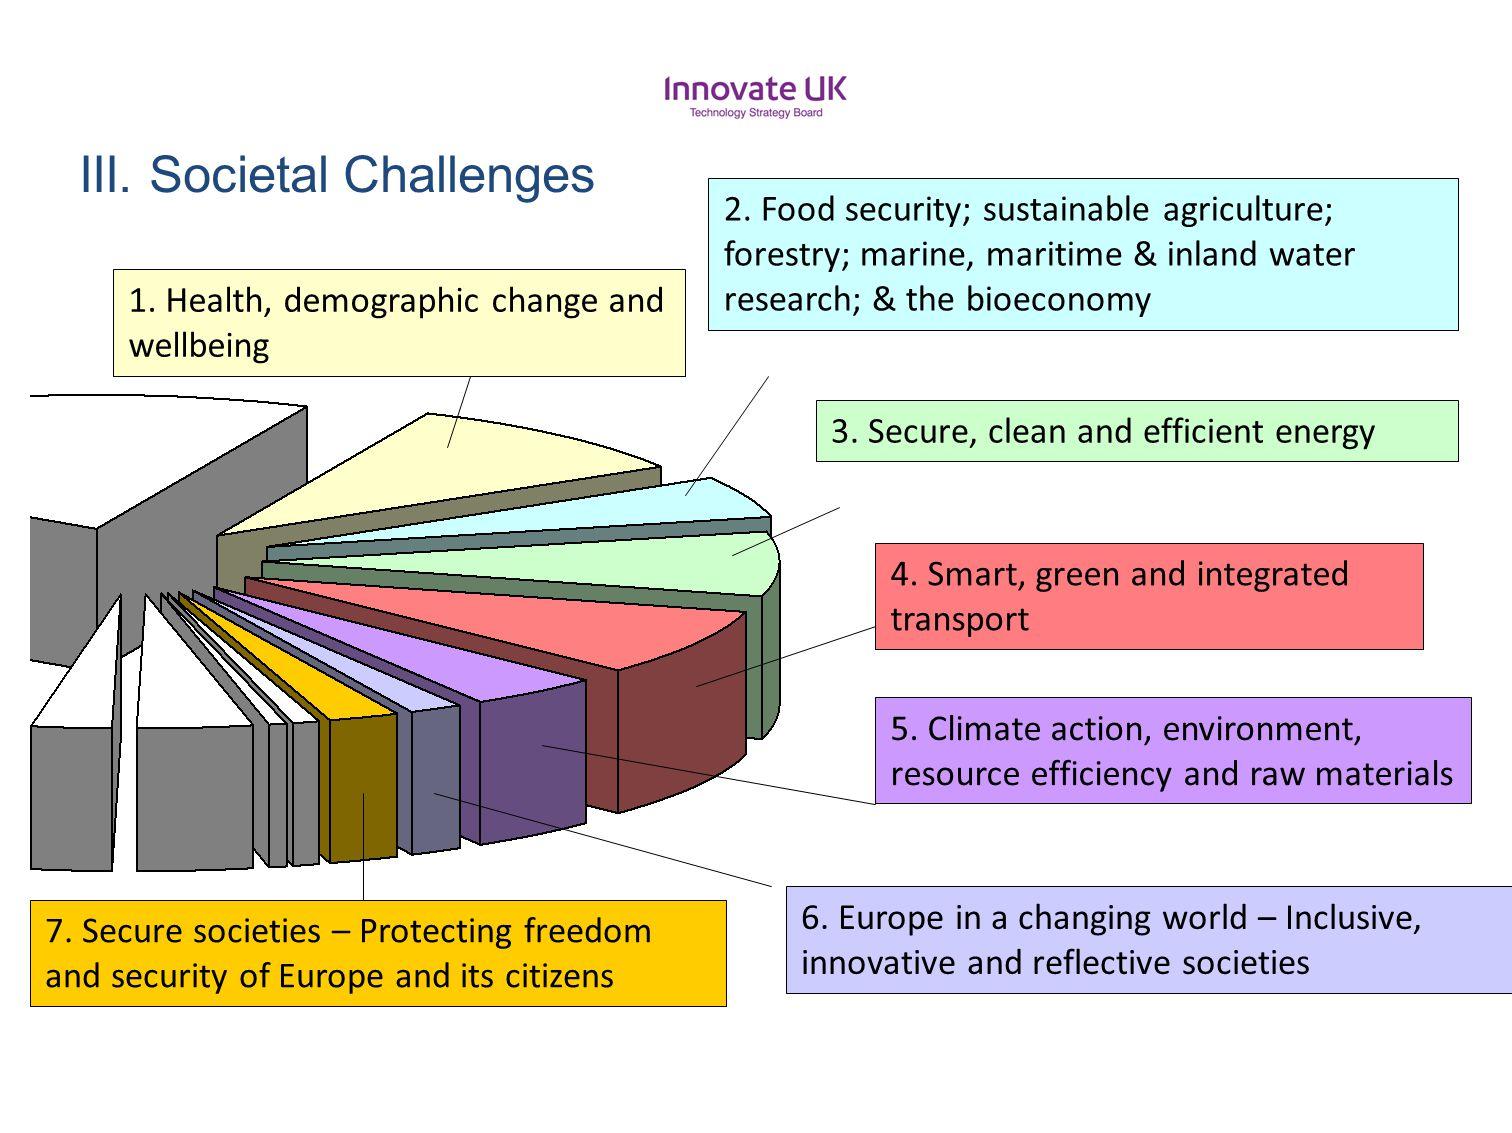 III. Societal Challenges